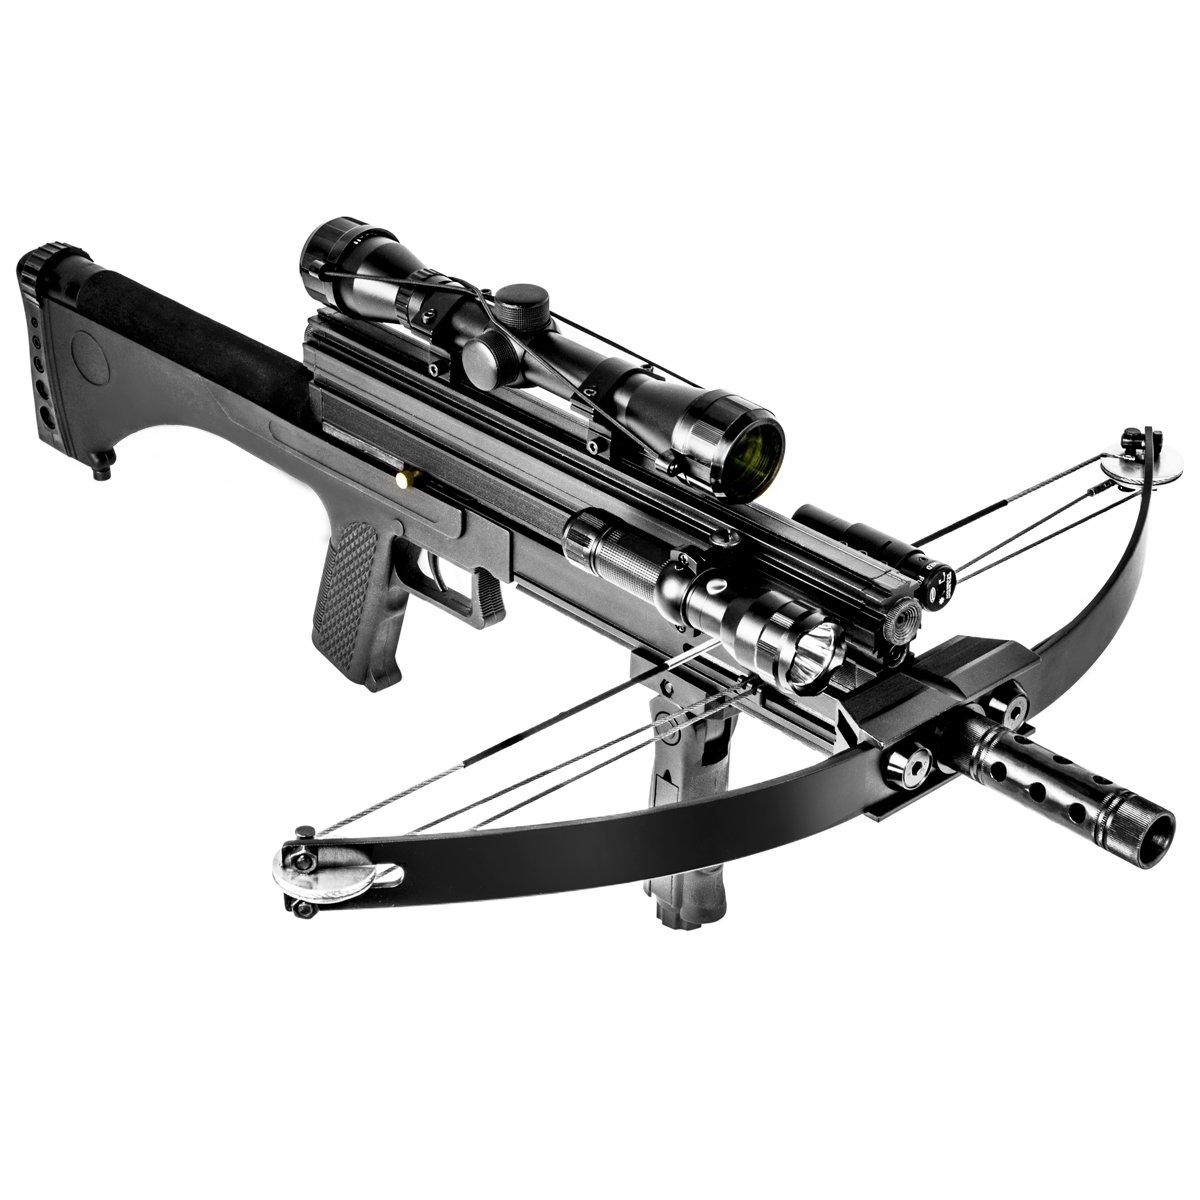 XtremepowerUS Multifunctional Crossbow 80 lbs 160 fps Hunting Equipment 200 Magazine Capacity